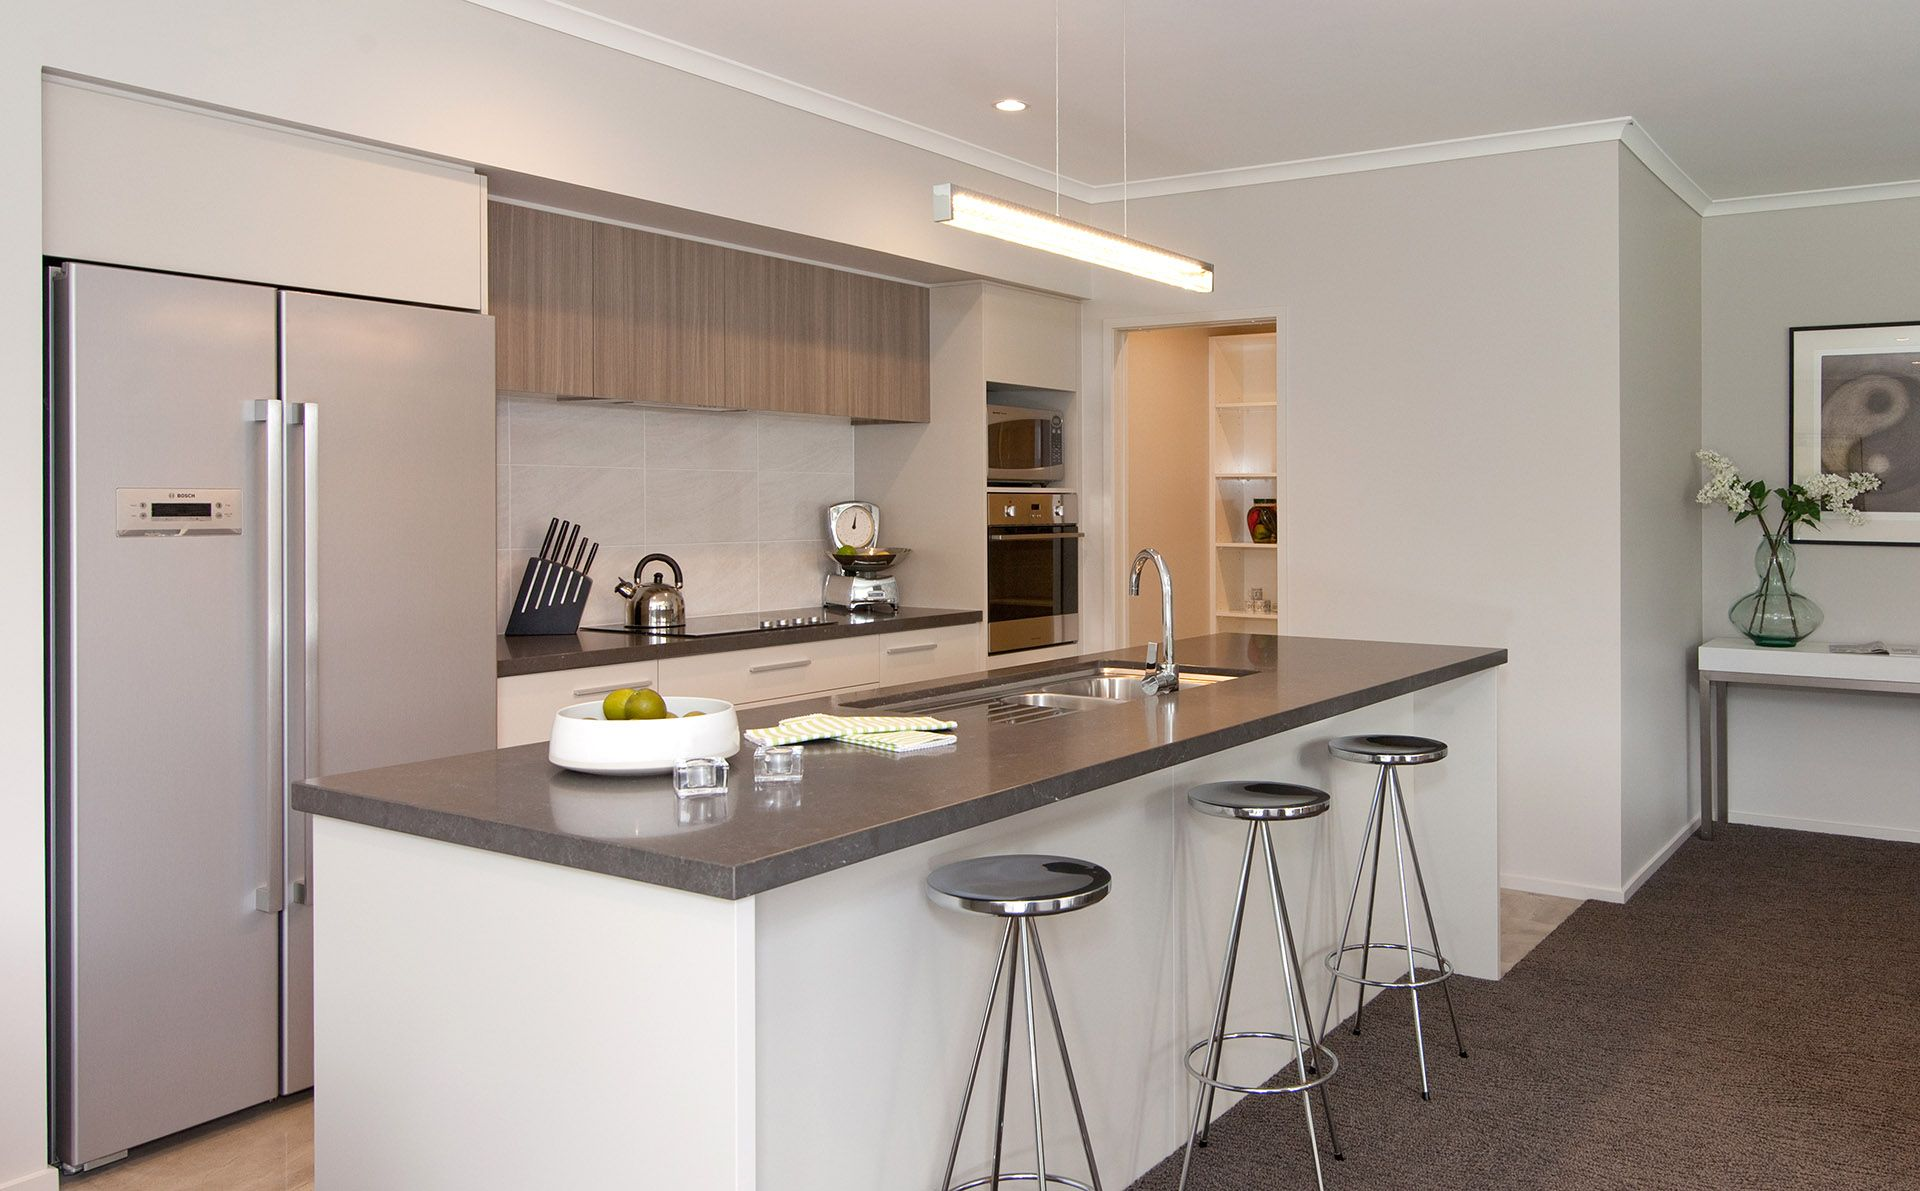 kitchen showhome g j gardner homes new zealand house design home house on g kitchen layout design id=30725